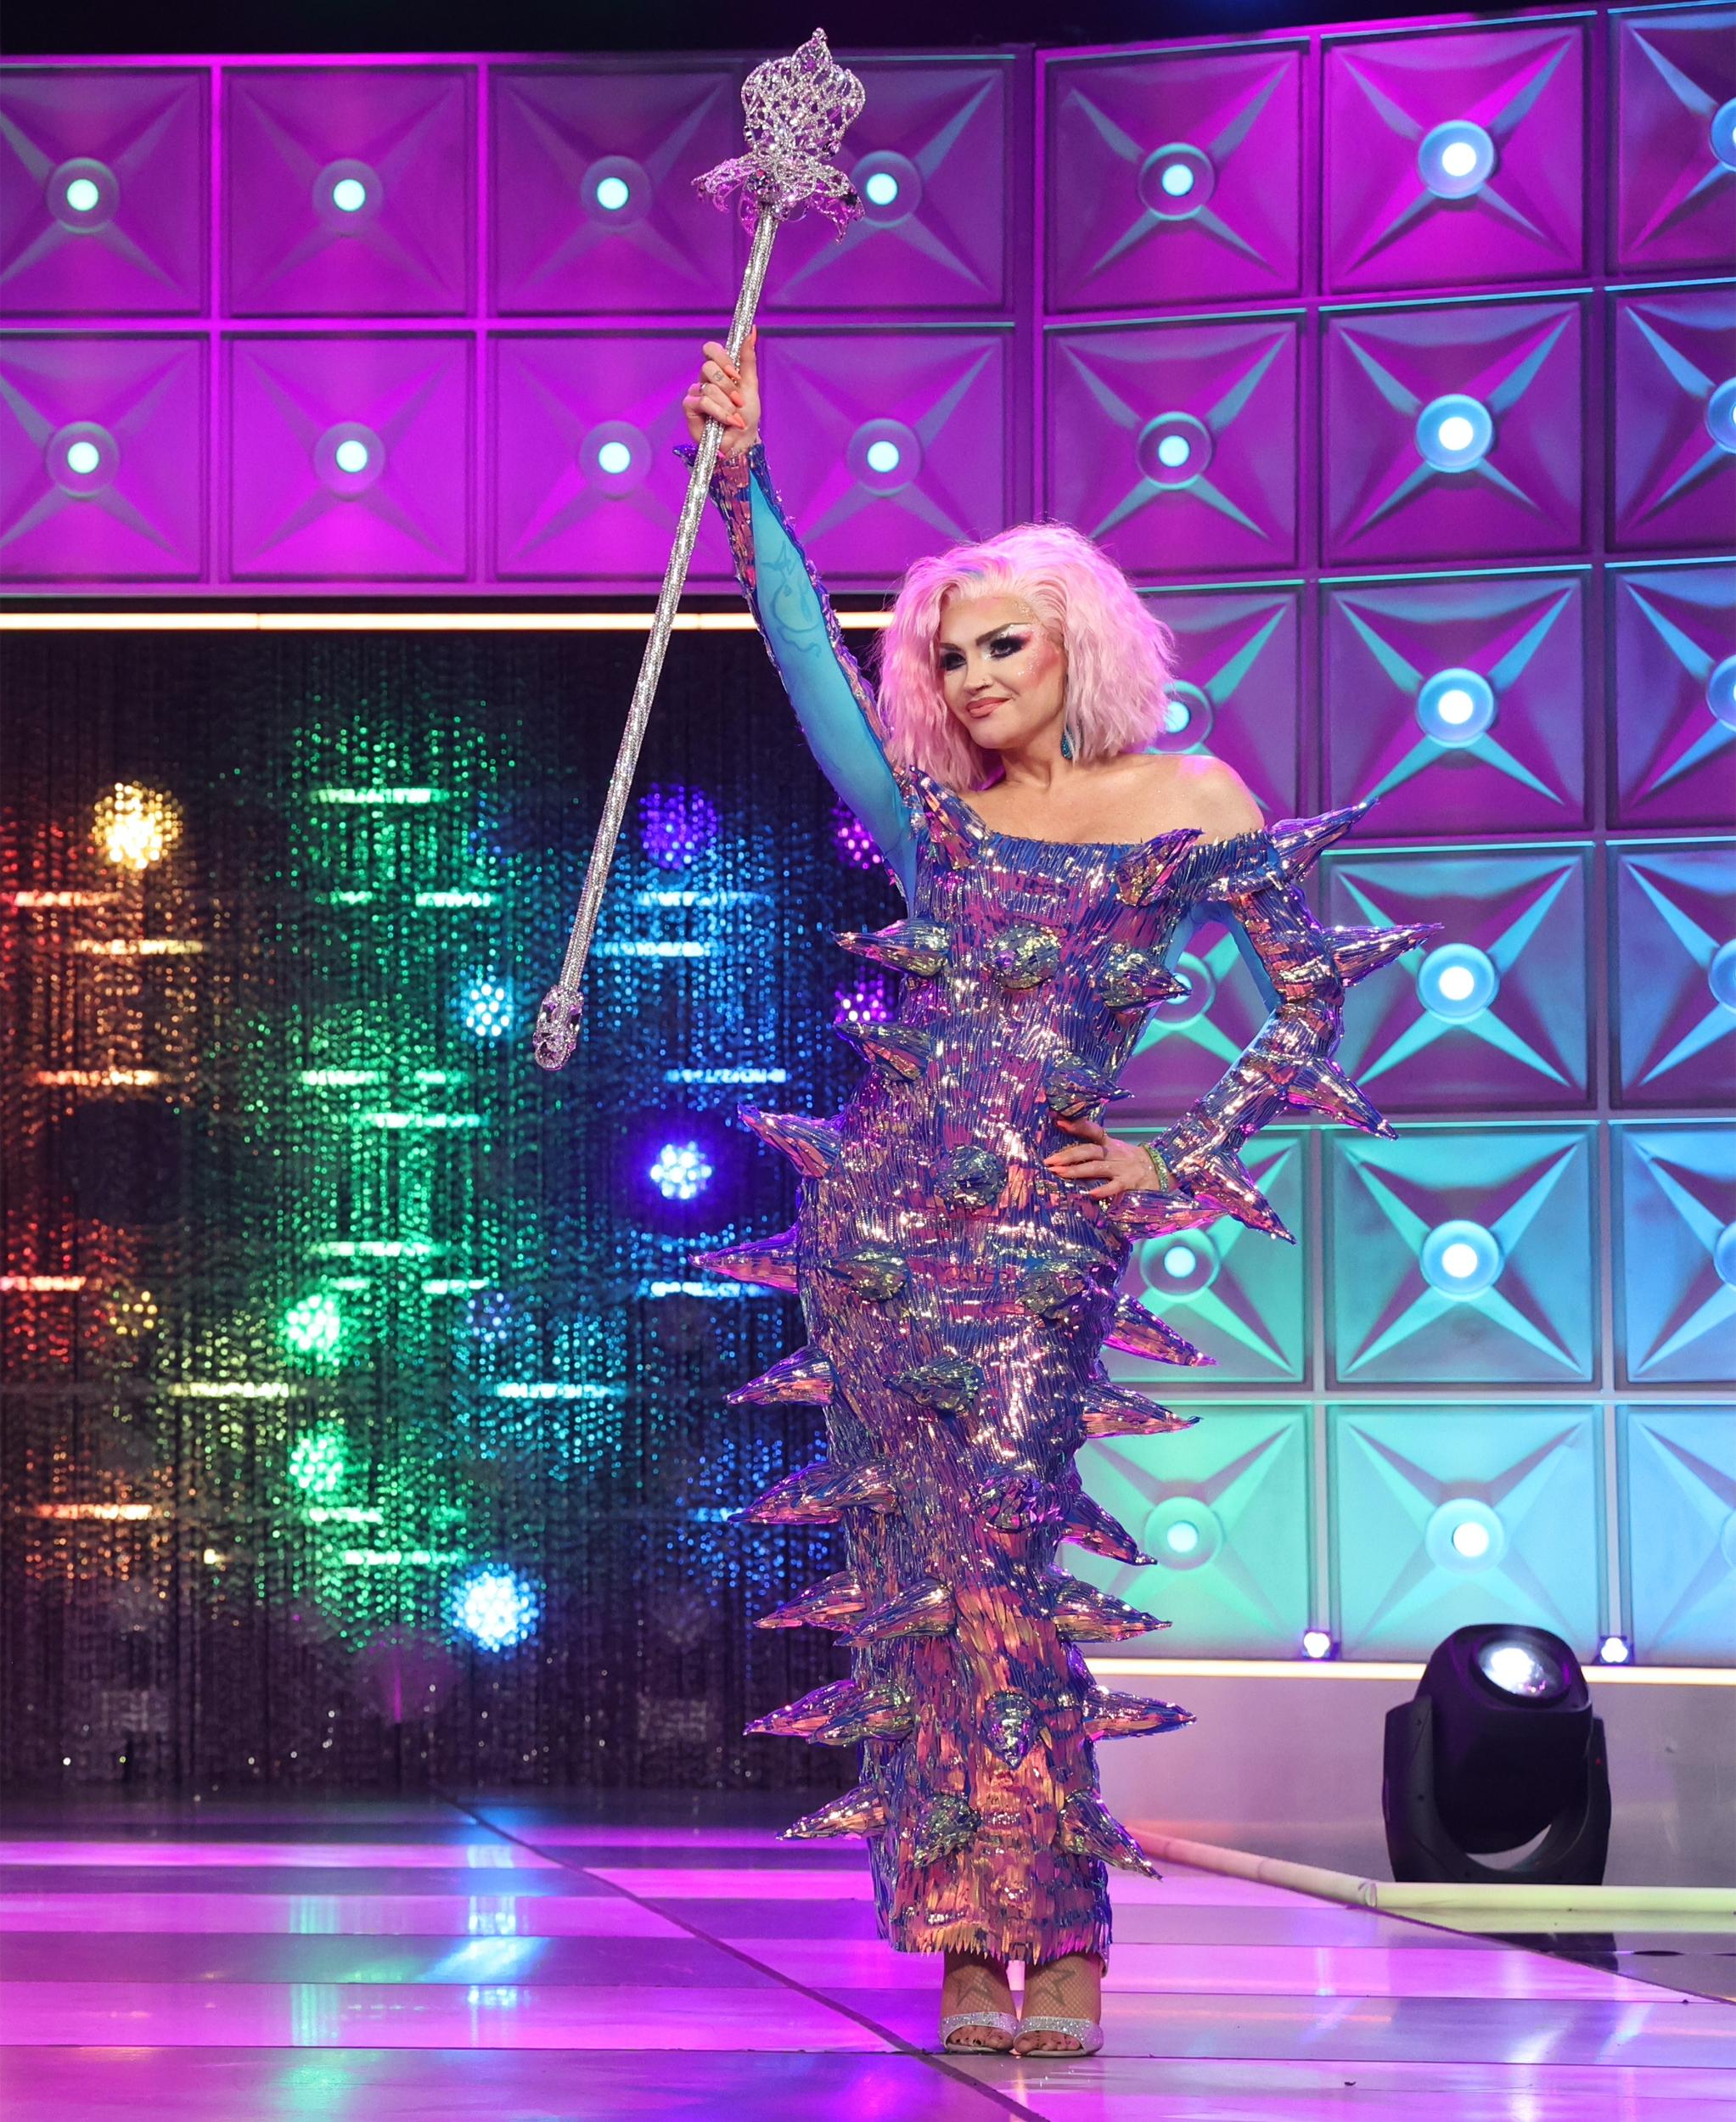 'Herstory' made: 'RuPaul's Drag Race' crowns first transgender winner